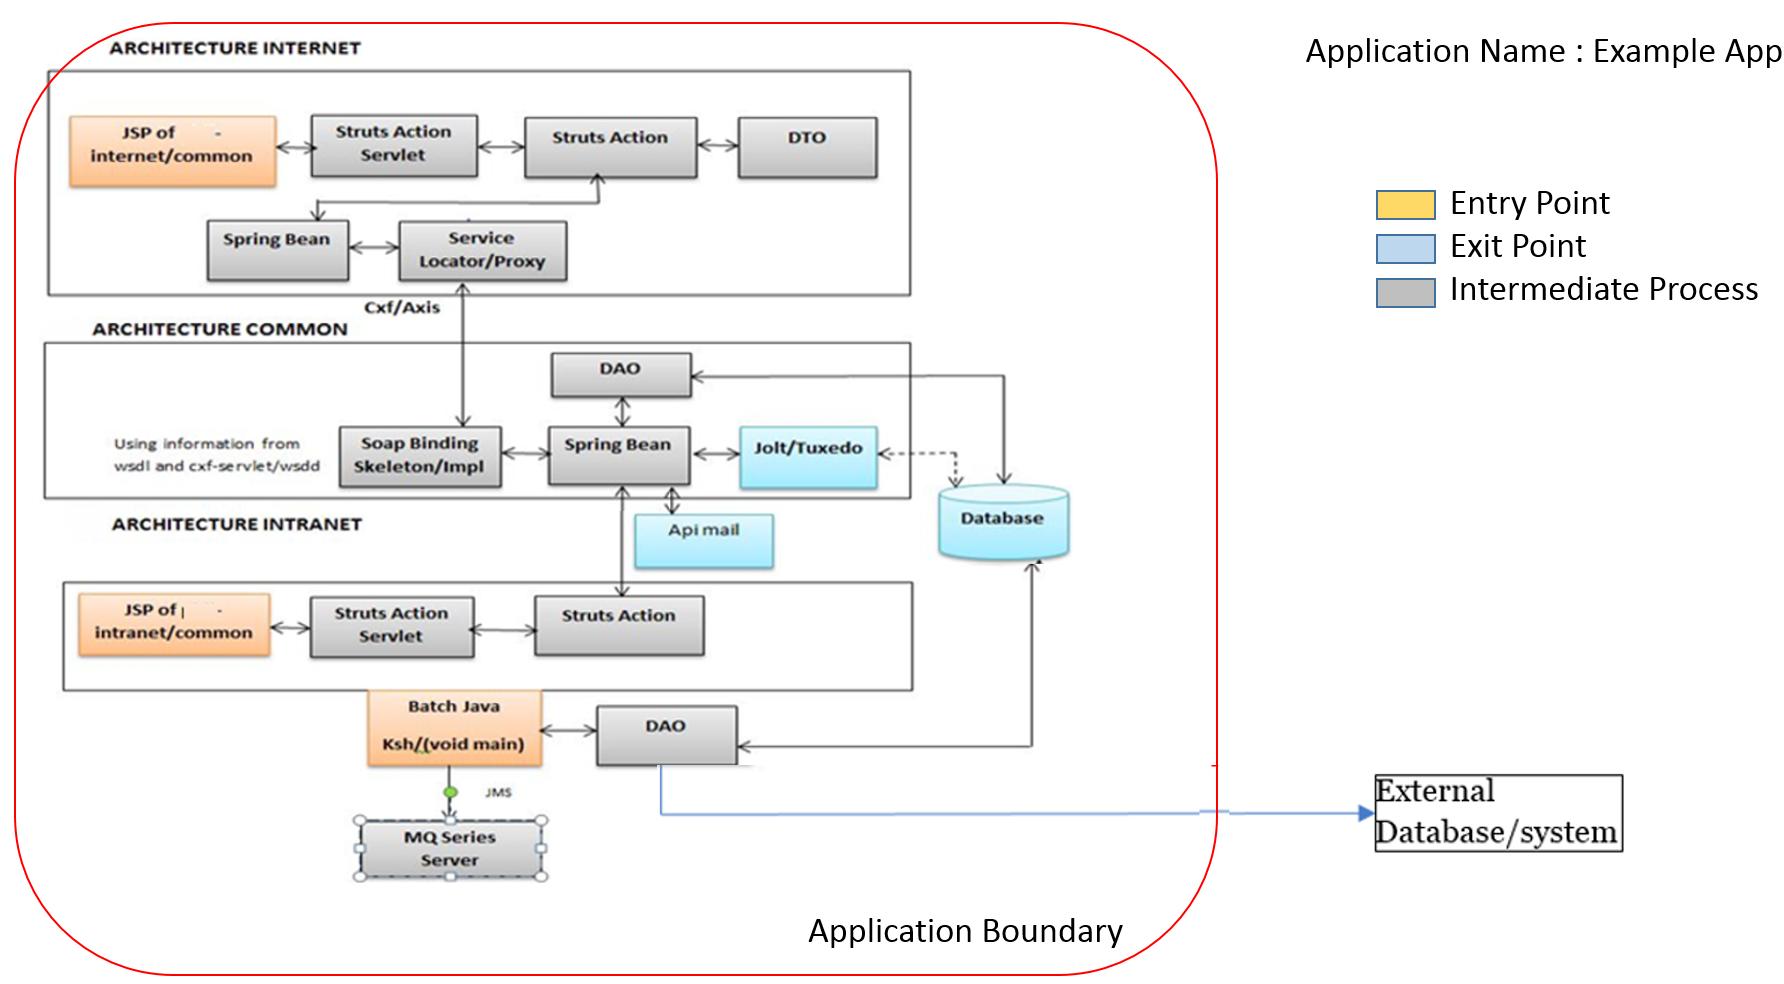 architecture context diagram field best practices cast. Black Bedroom Furniture Sets. Home Design Ideas